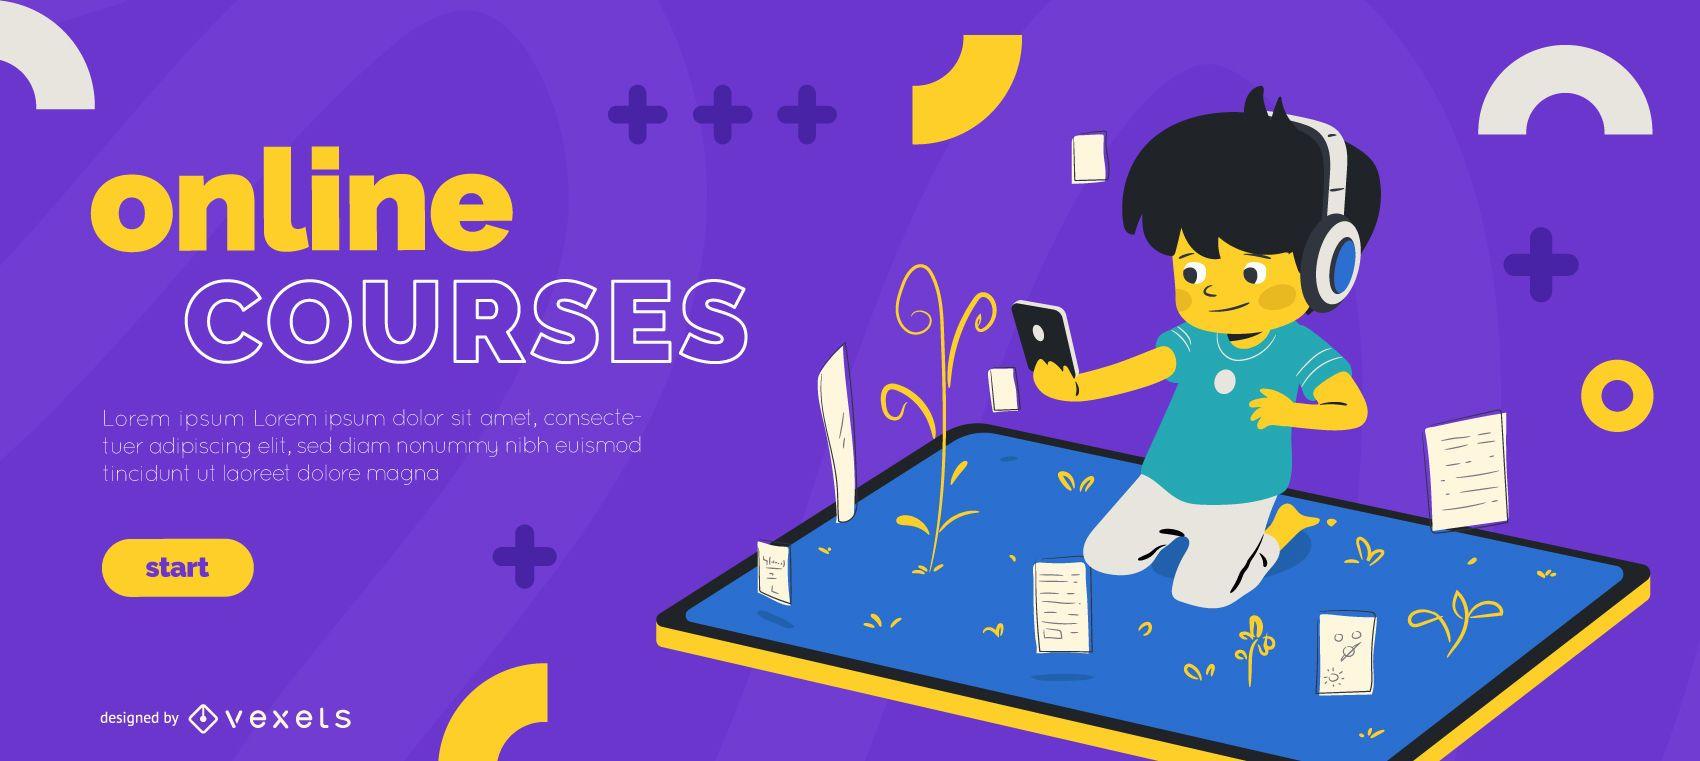 Online courses kids slider template